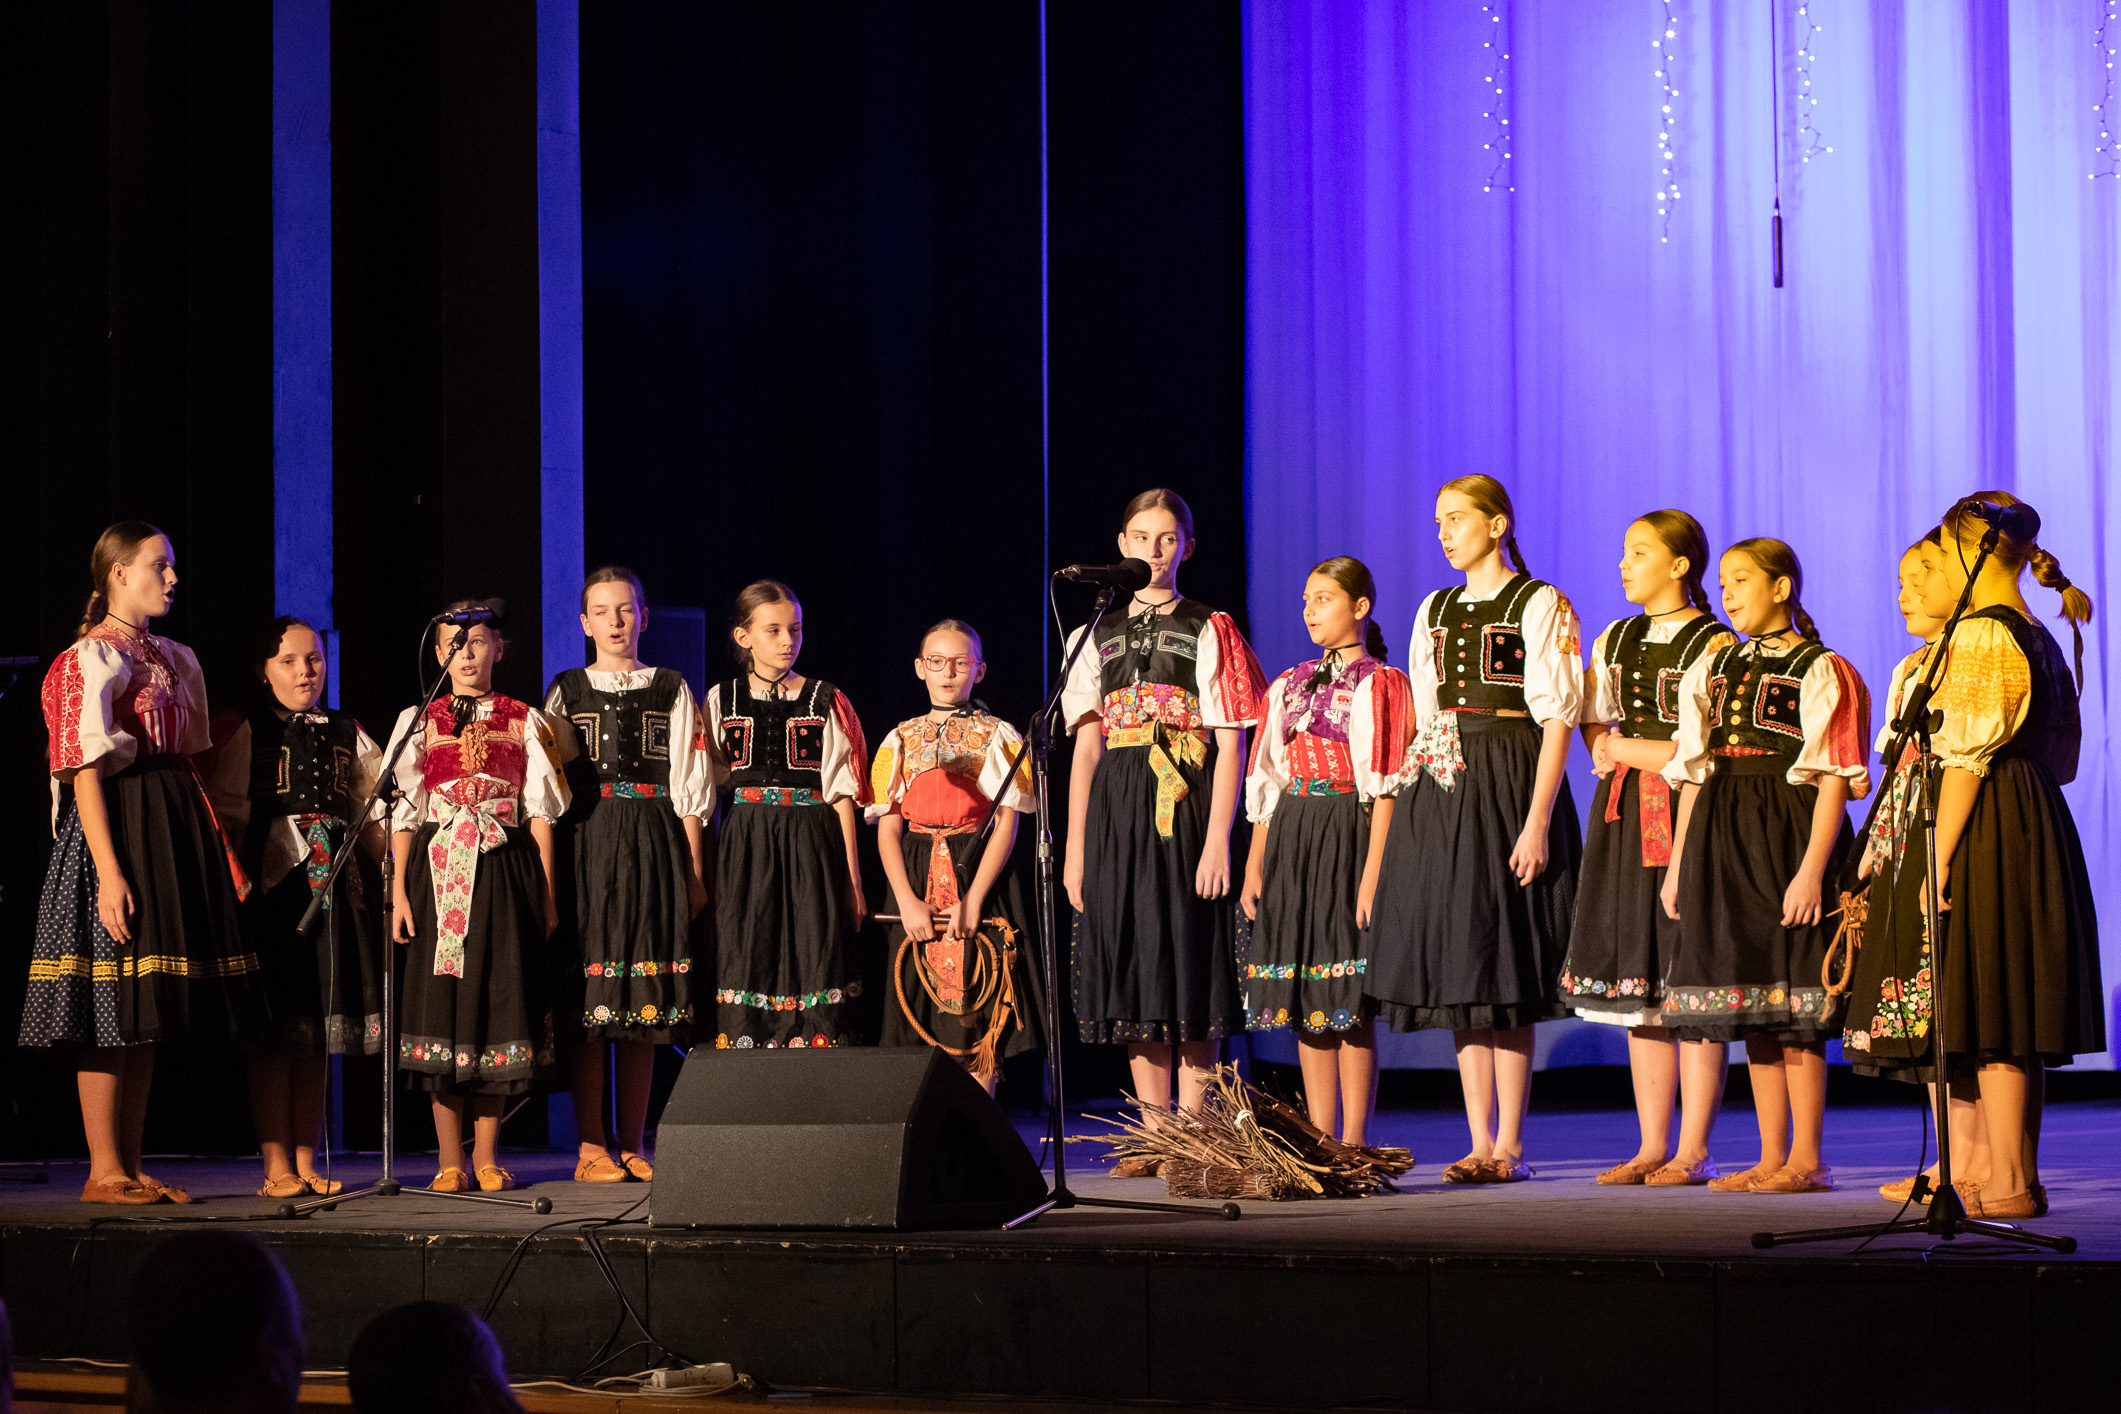 nadych-vianoc-zornicka-marina-10